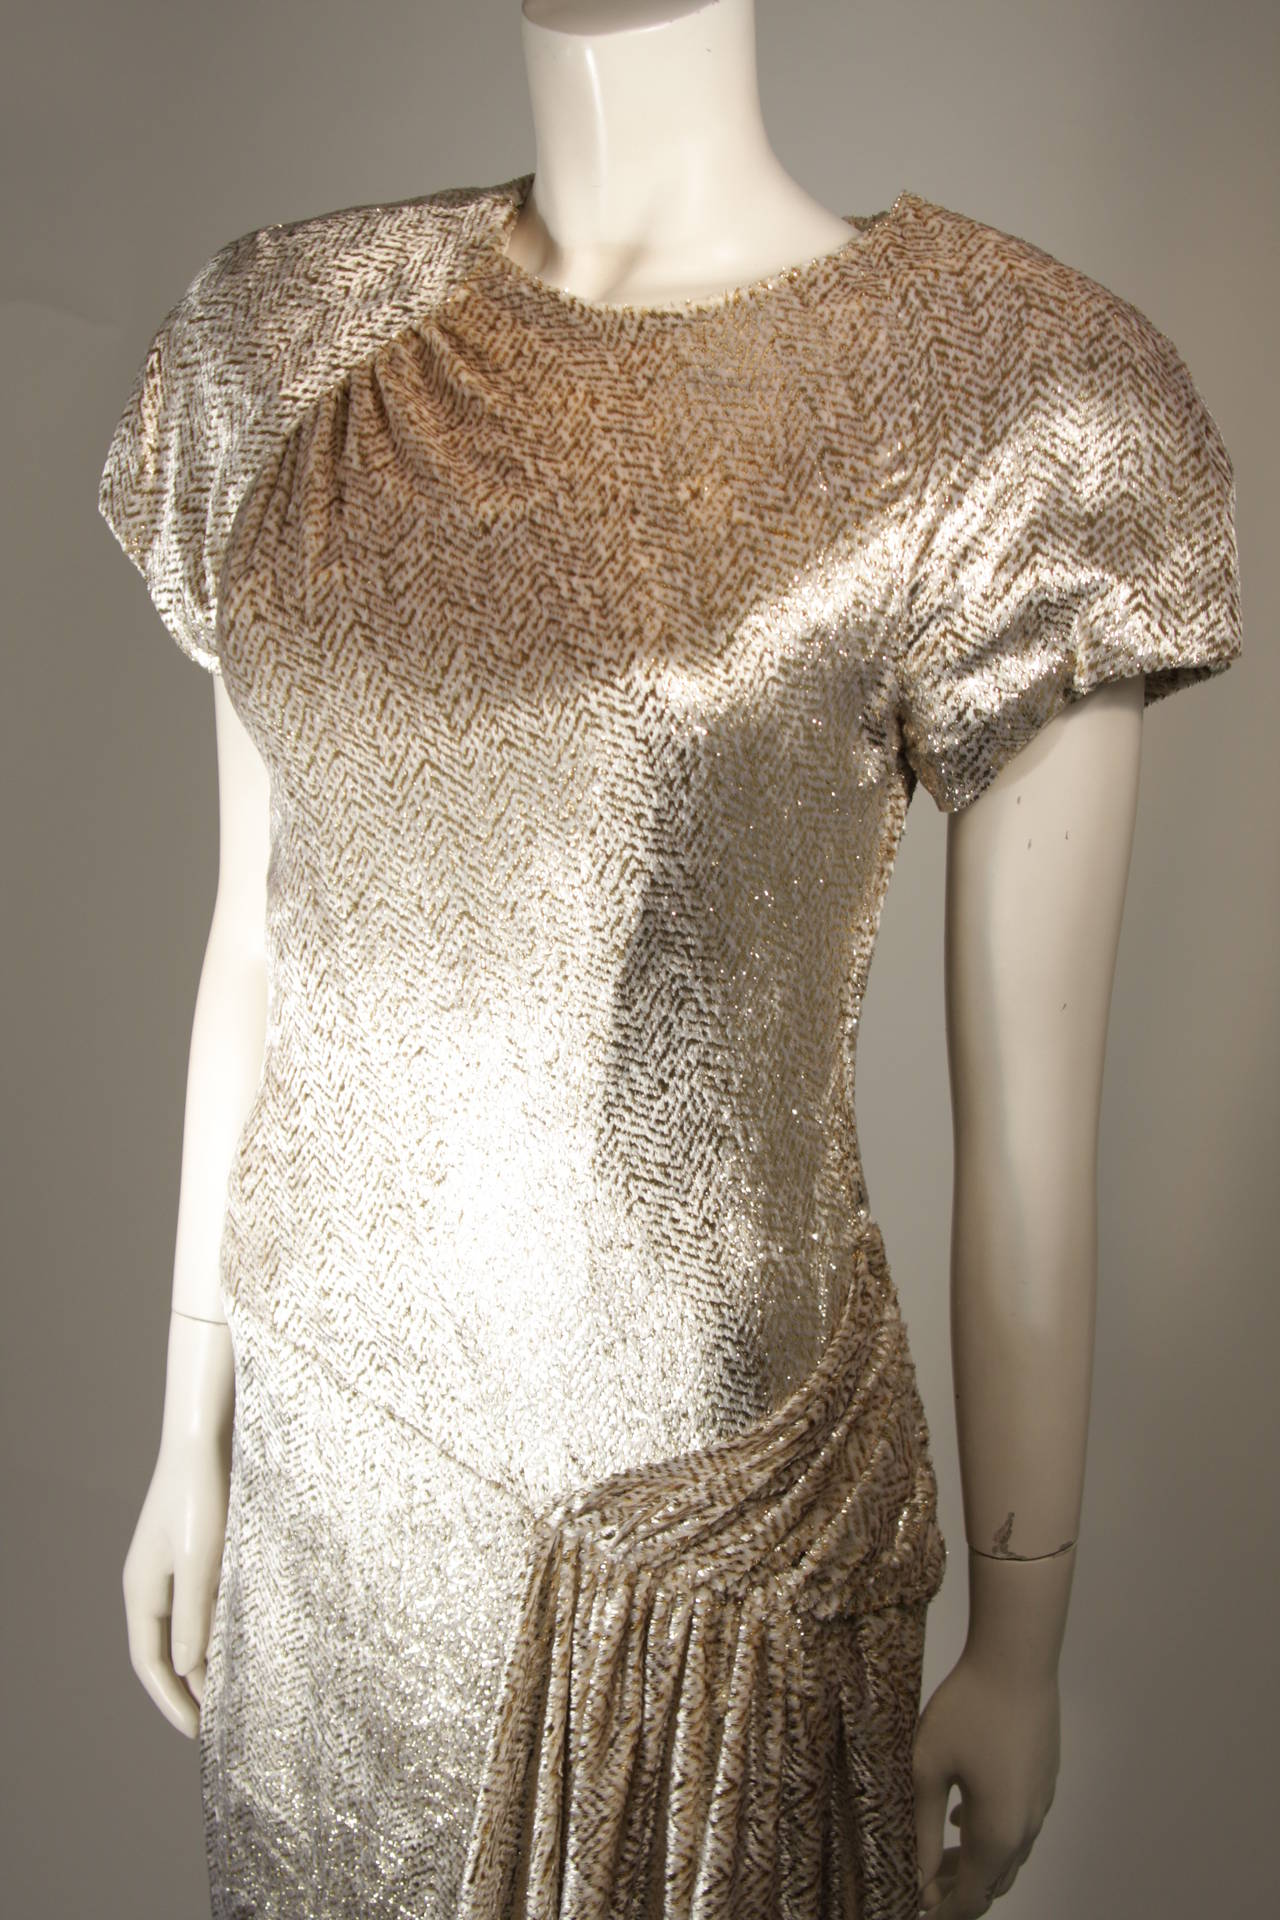 Men's Vicky Tiel Ivory and Gold Velvet Texture Cocktail Dress Size 38 For Sale